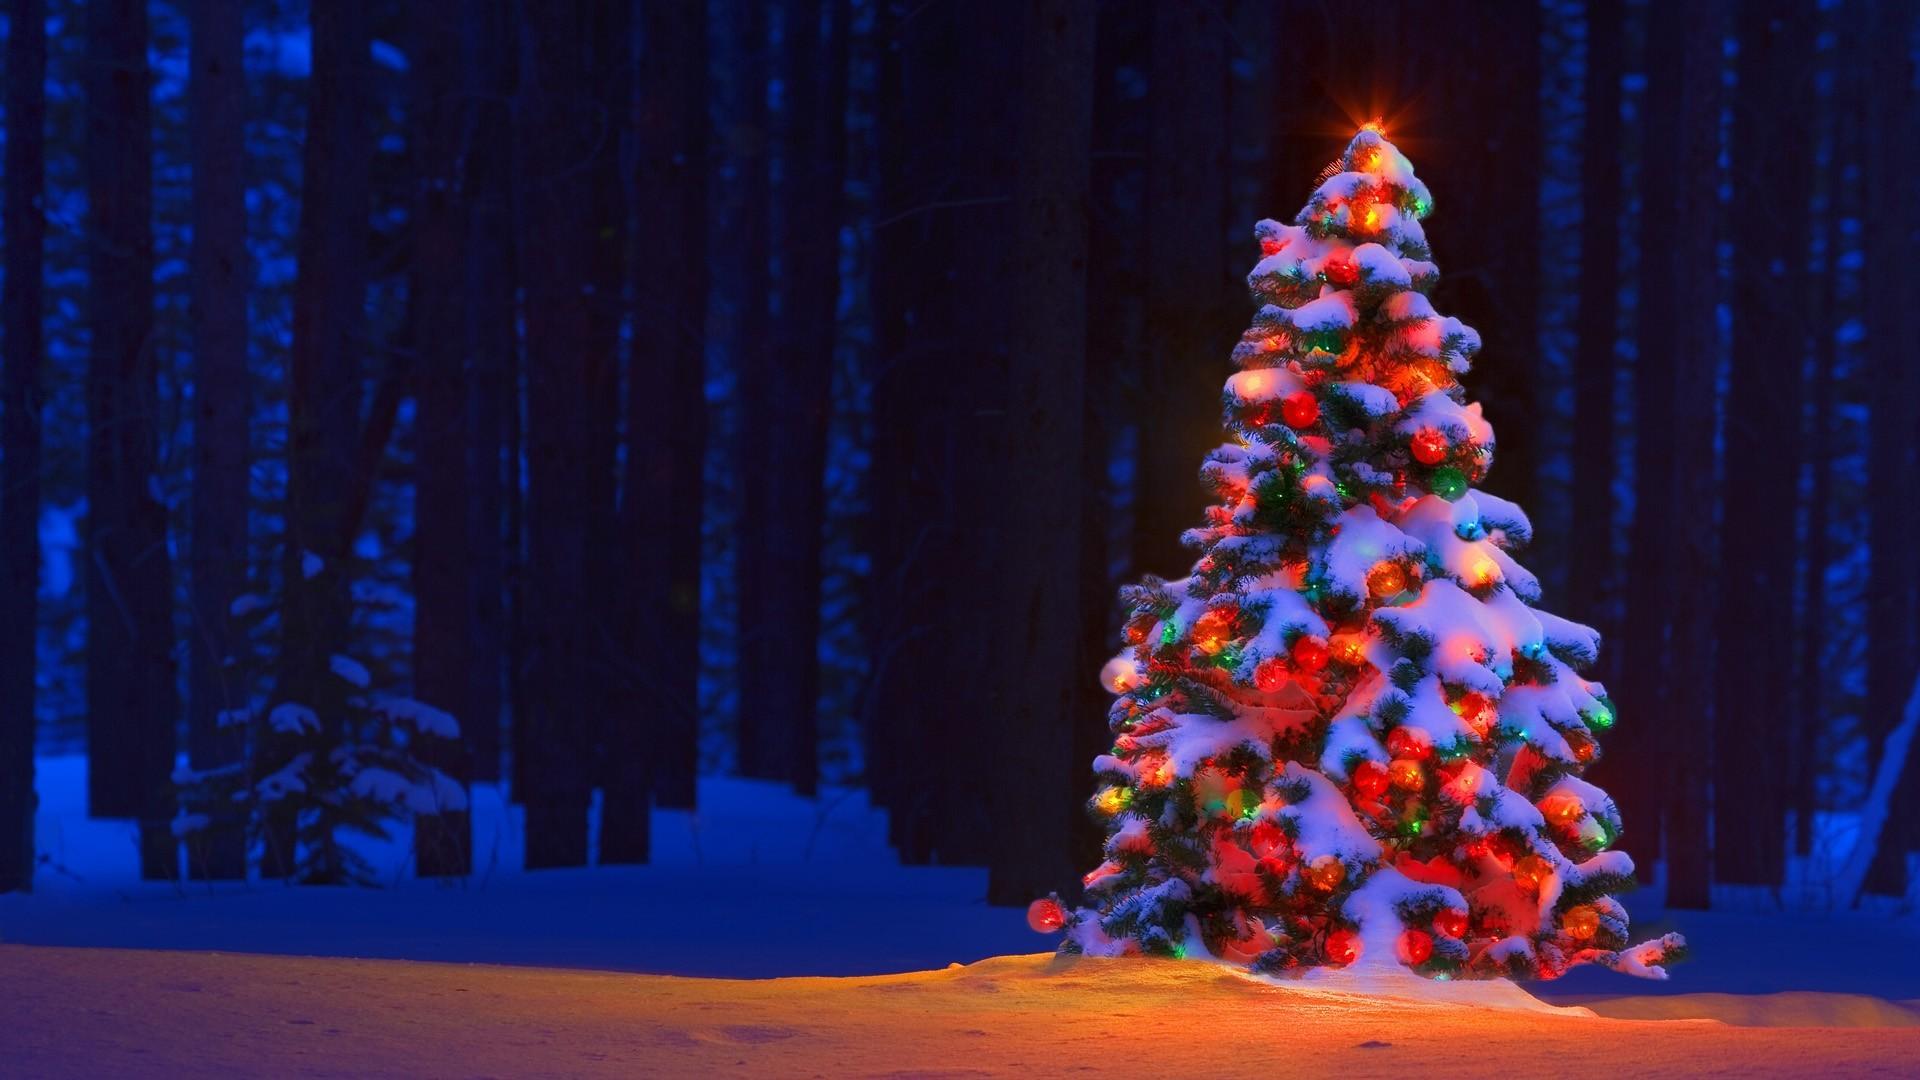 Christmas tree desktop background 74 images 1920x1080 christmas lights tree desktop backgrounds voltagebd Gallery